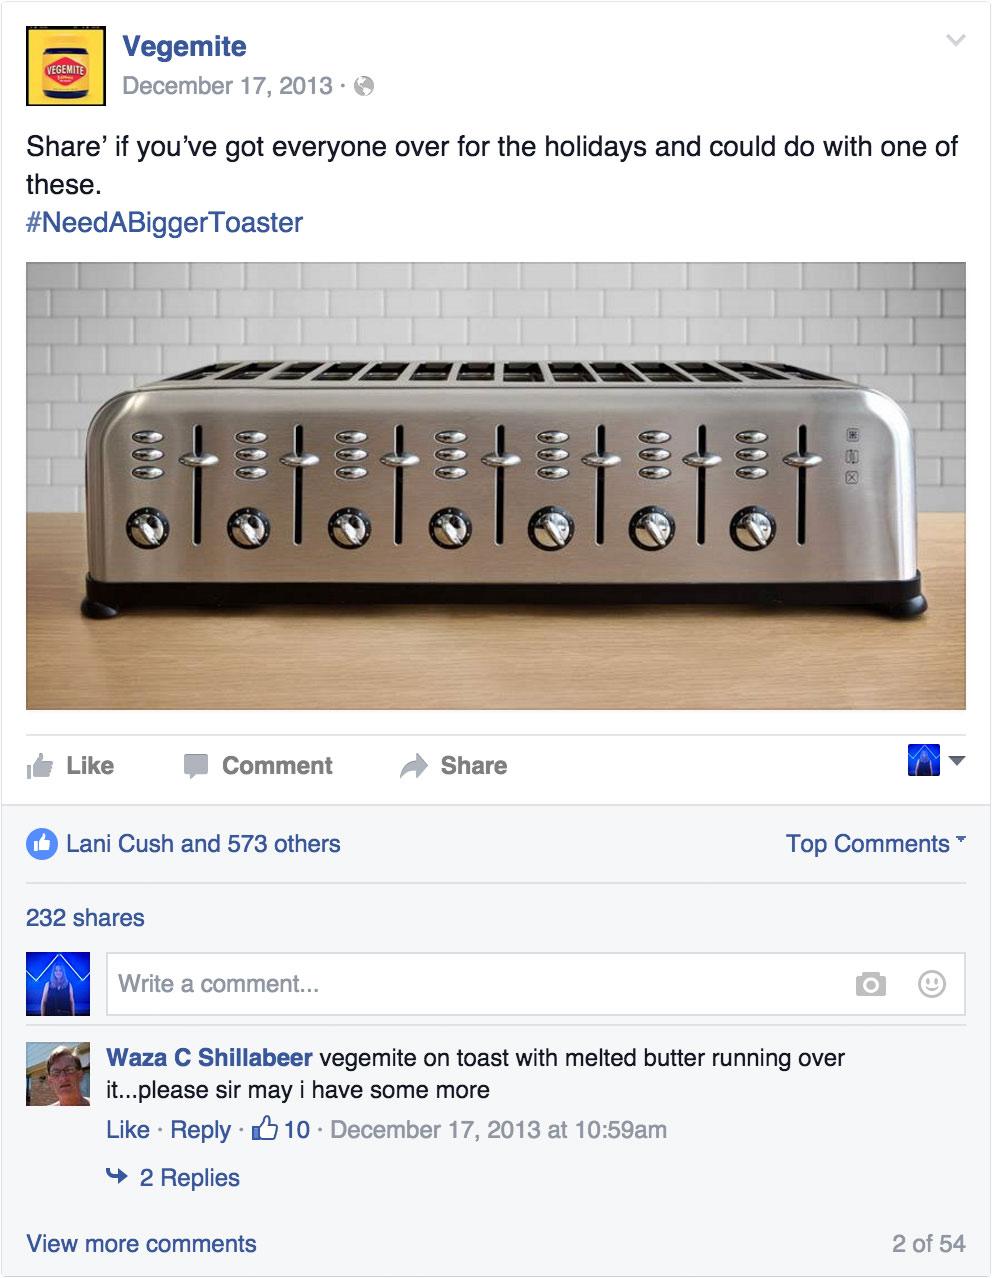 vegemite_toaster